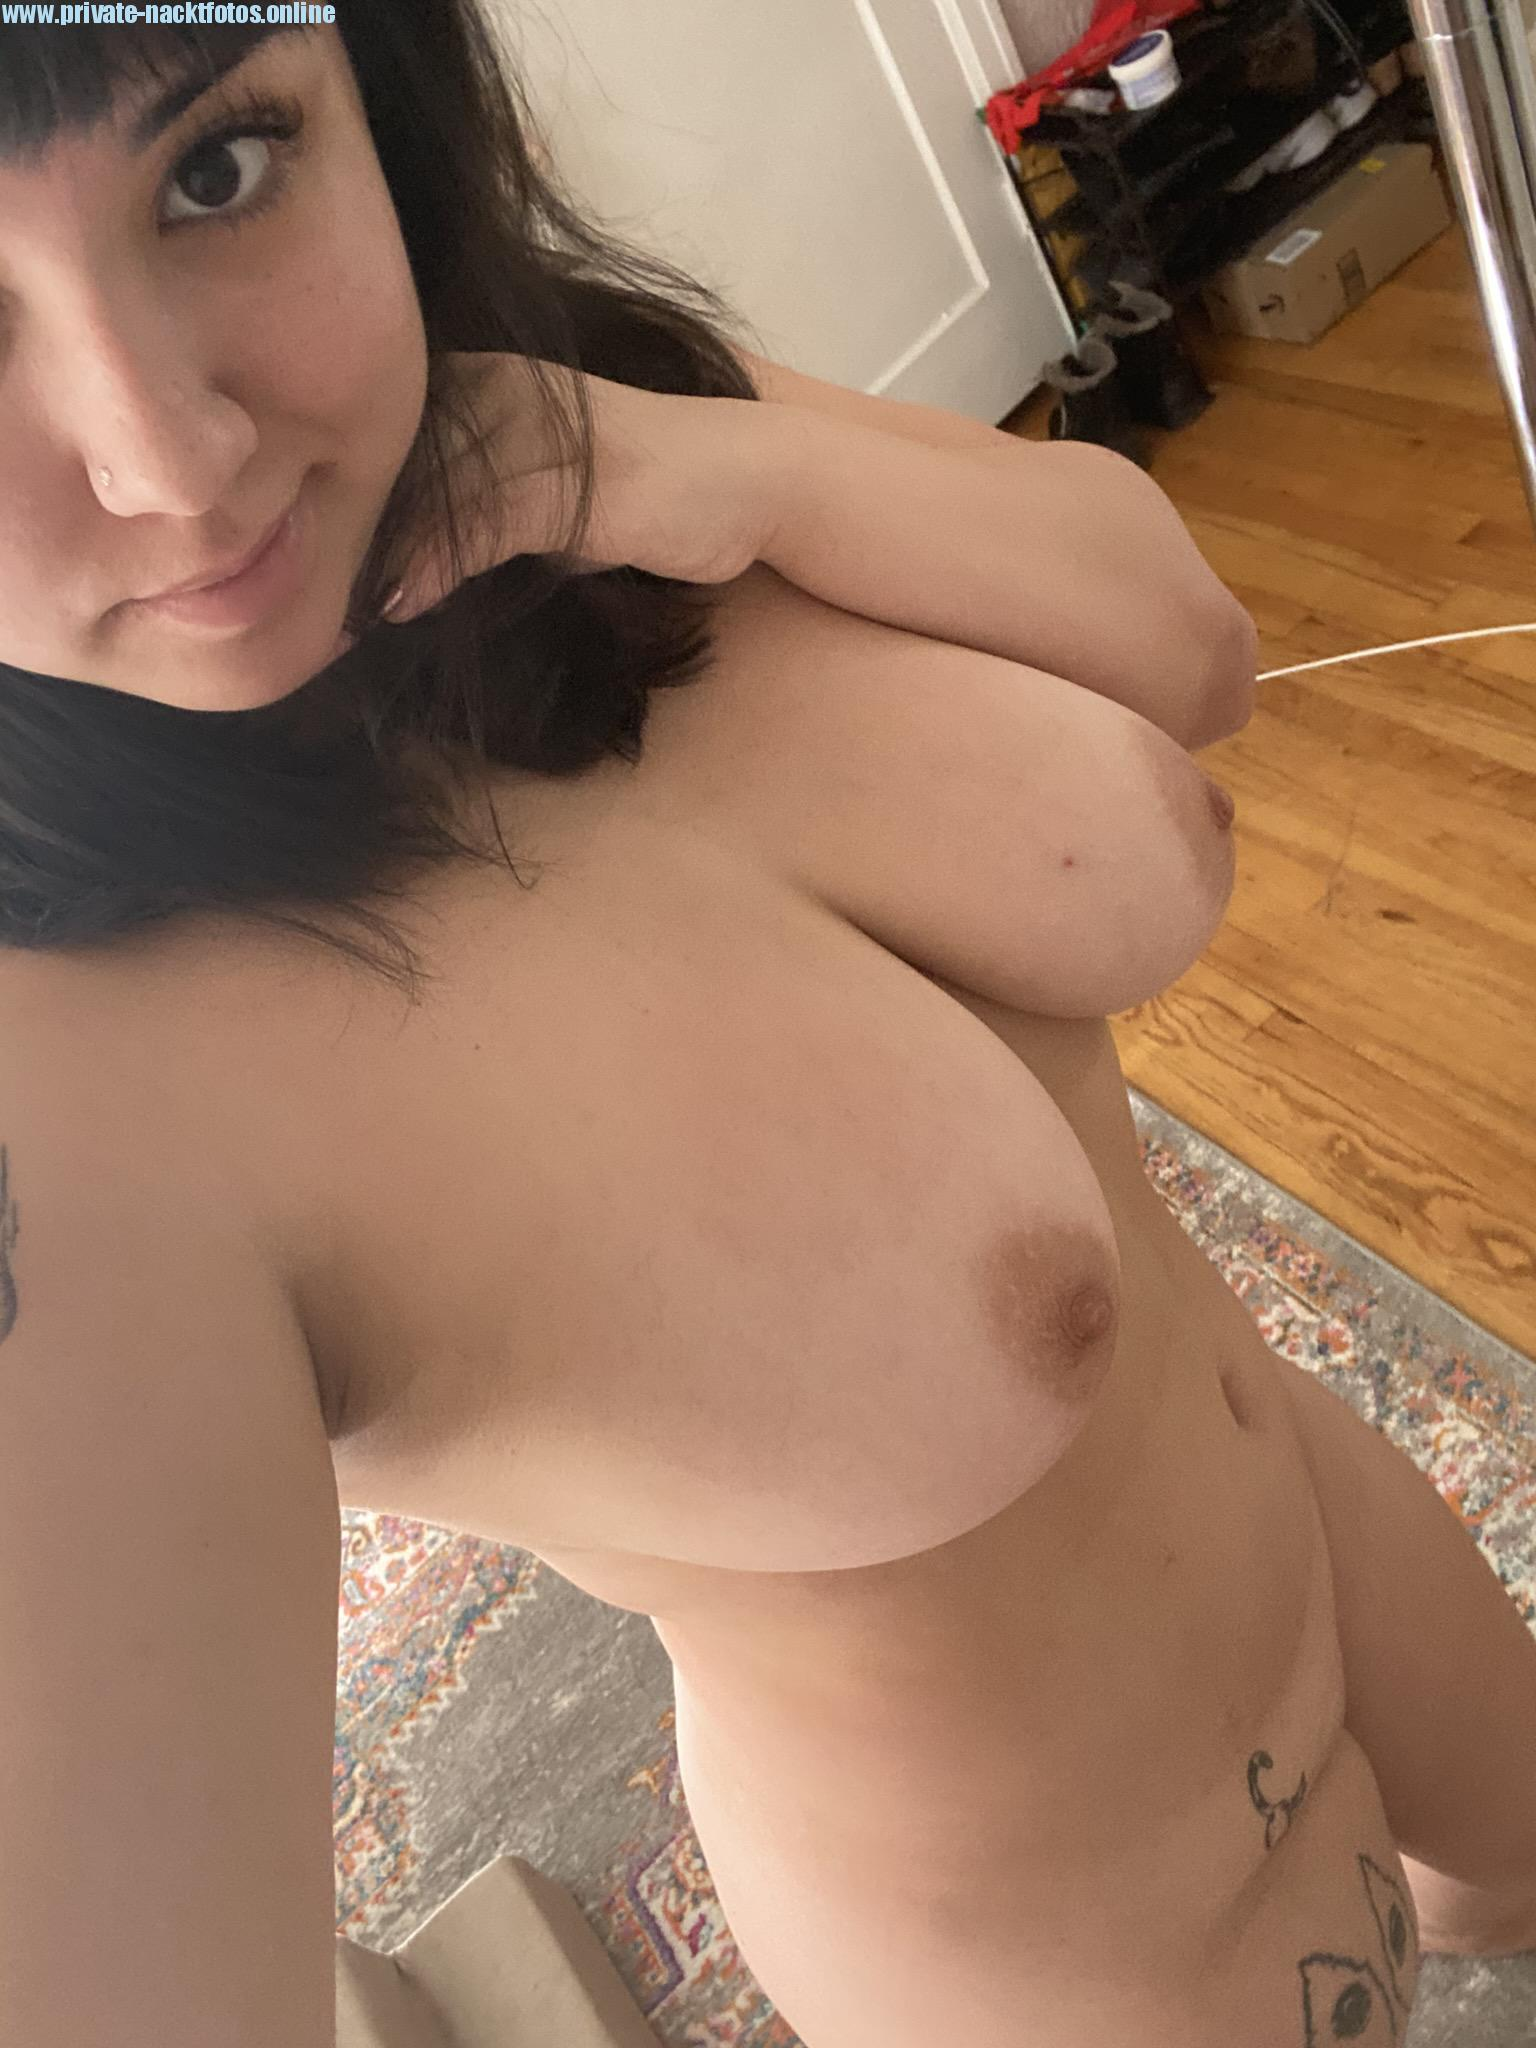 Schoene Natuerliche Dicke Teen Titten Nacktfoto Selfie